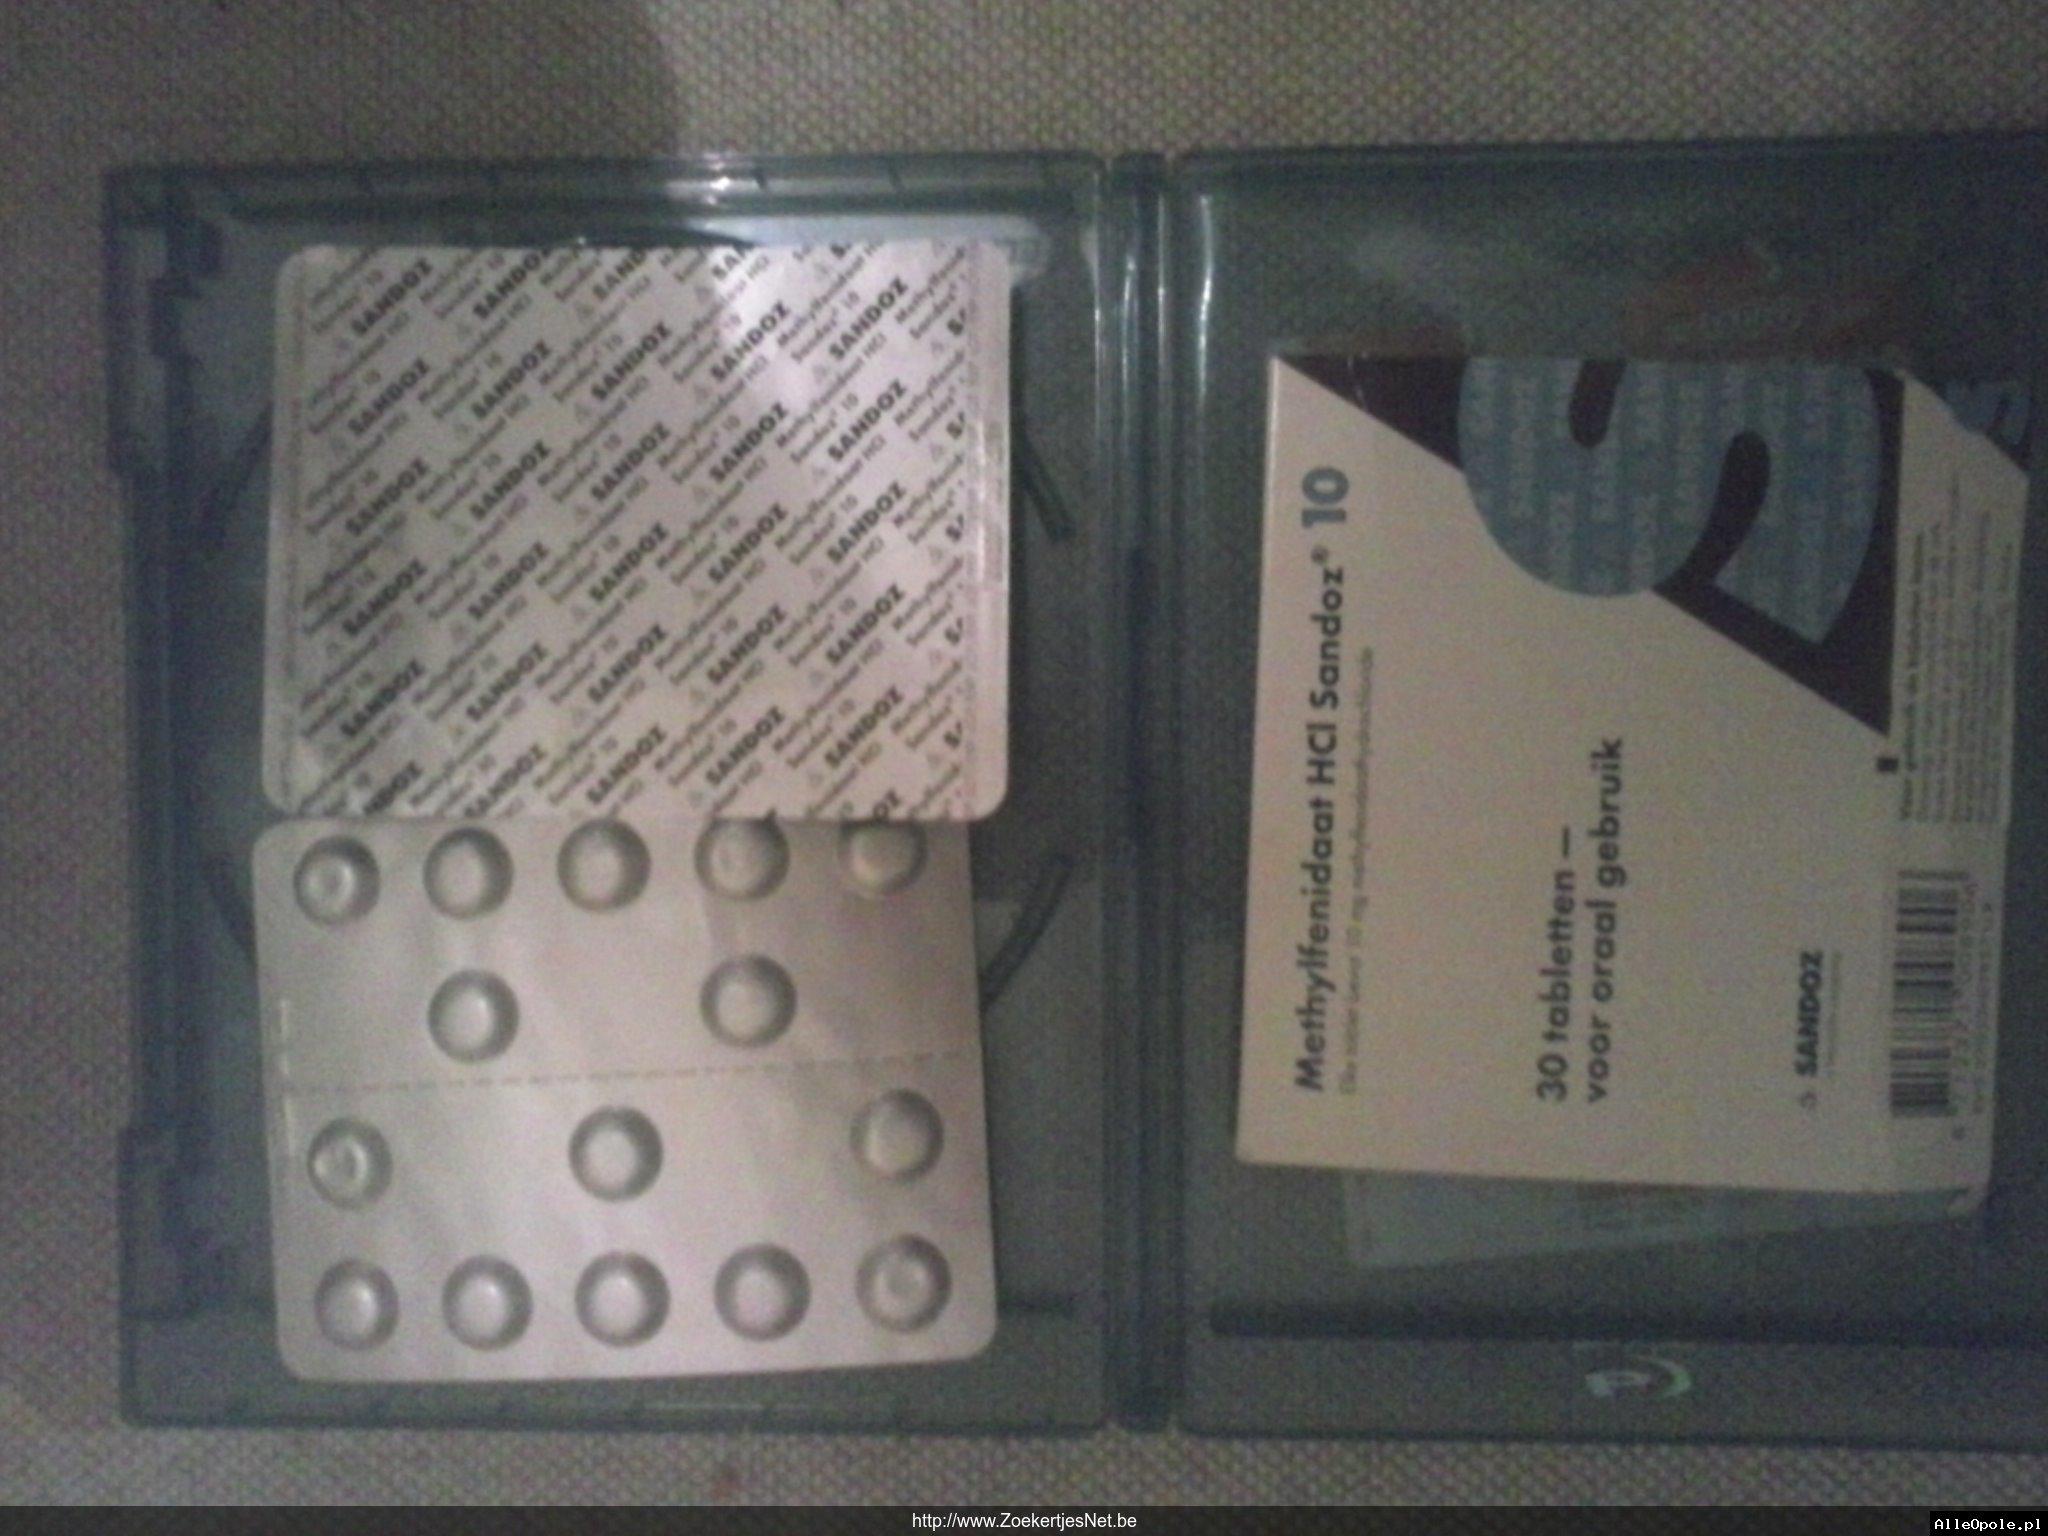 Morfin / oxycodon / fentanyl